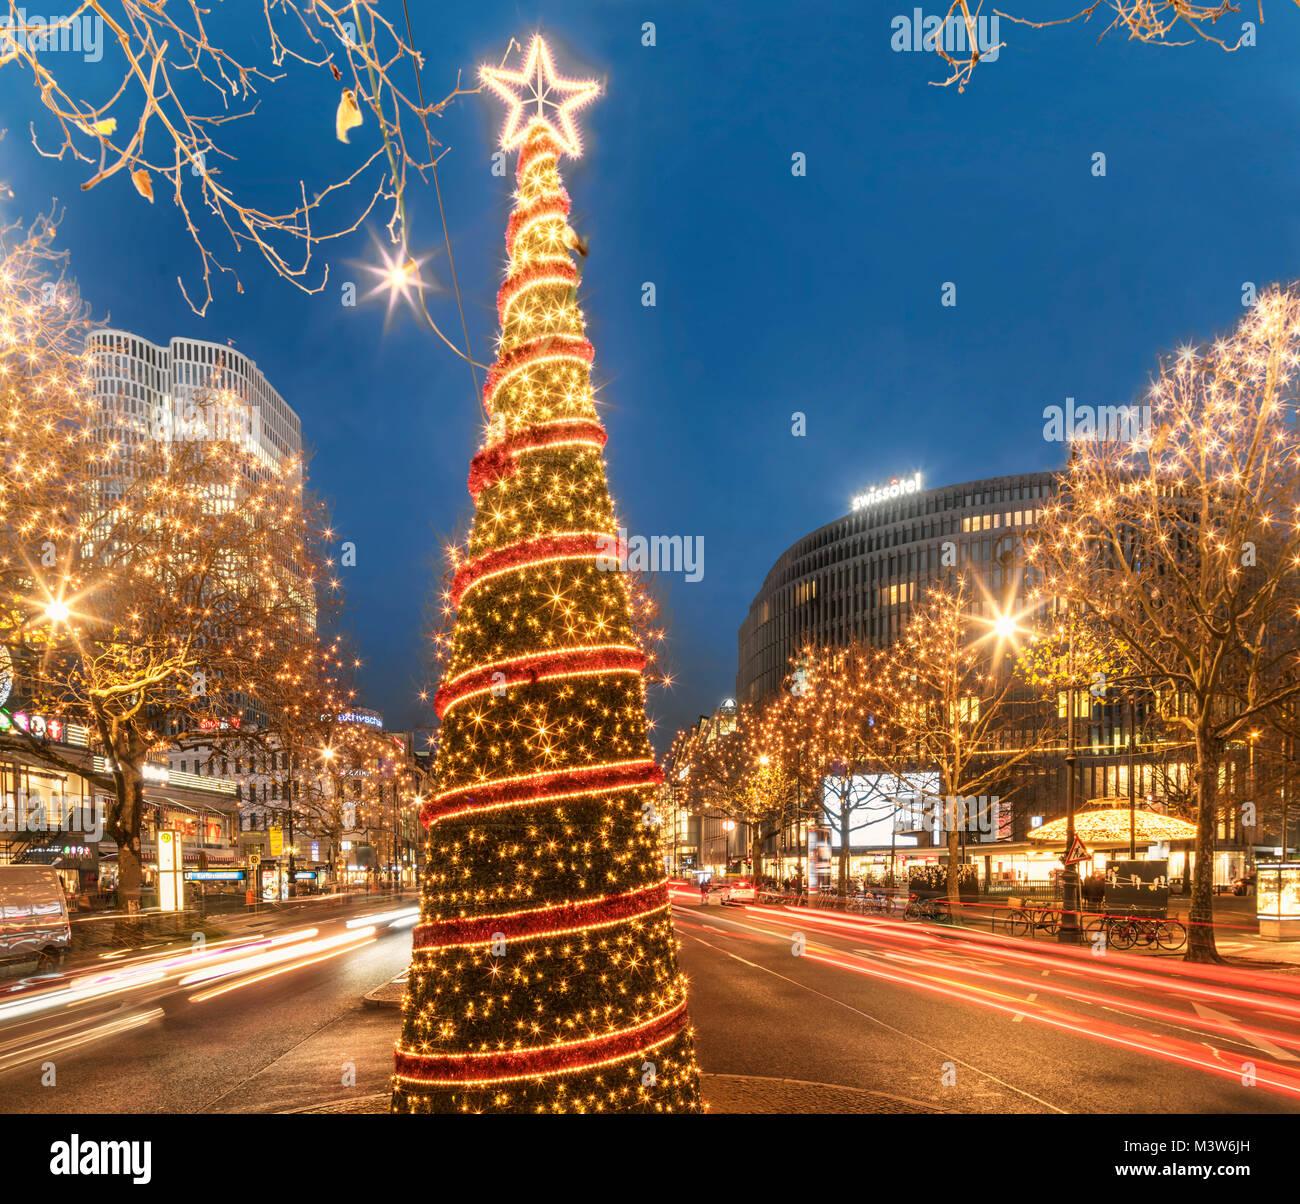 Weihnachtsbeleuchtung Kurfürstendamm.Christmas Illumination Kurfuerstendamm Kuhdamm Berlin Stock Photo